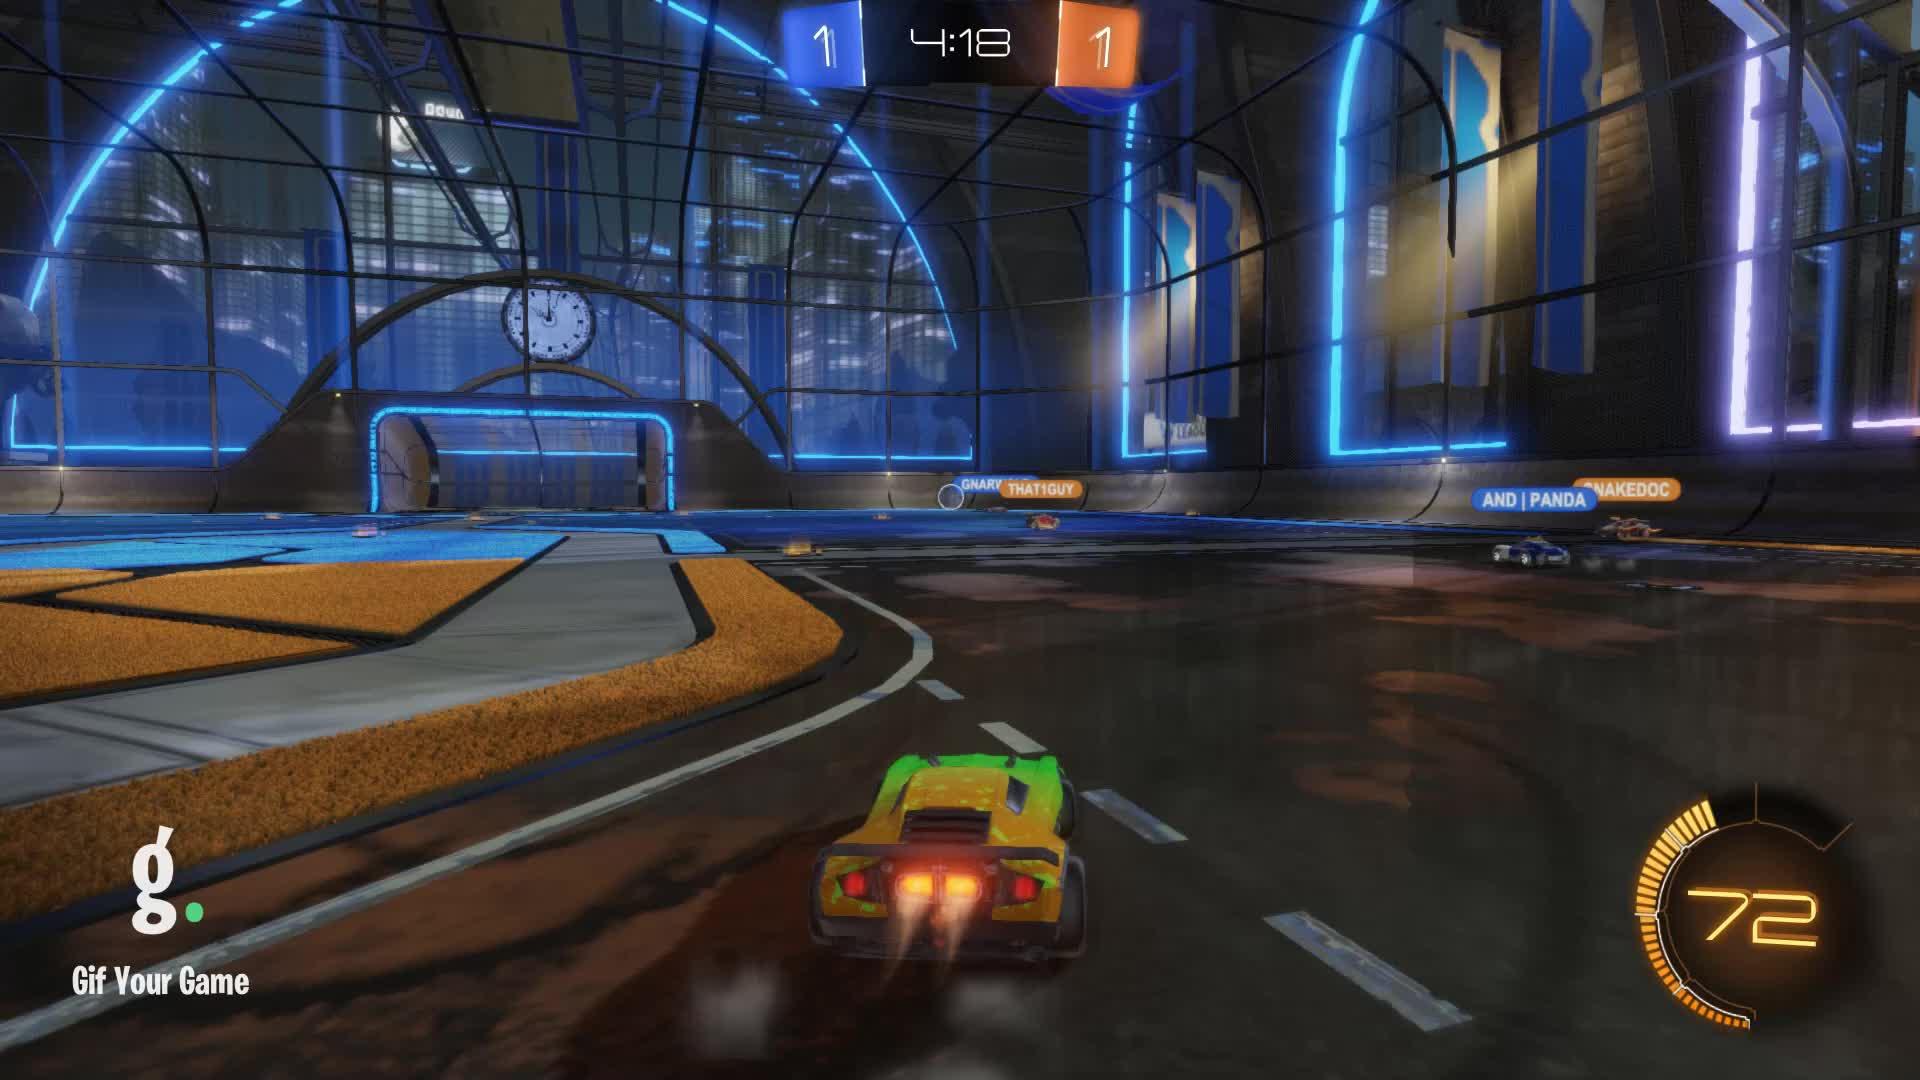 Gif Your Game, GifYourGame, Rocket League, RocketLeague, datboi | CLS, Goal 3: datboi | CLS GIFs